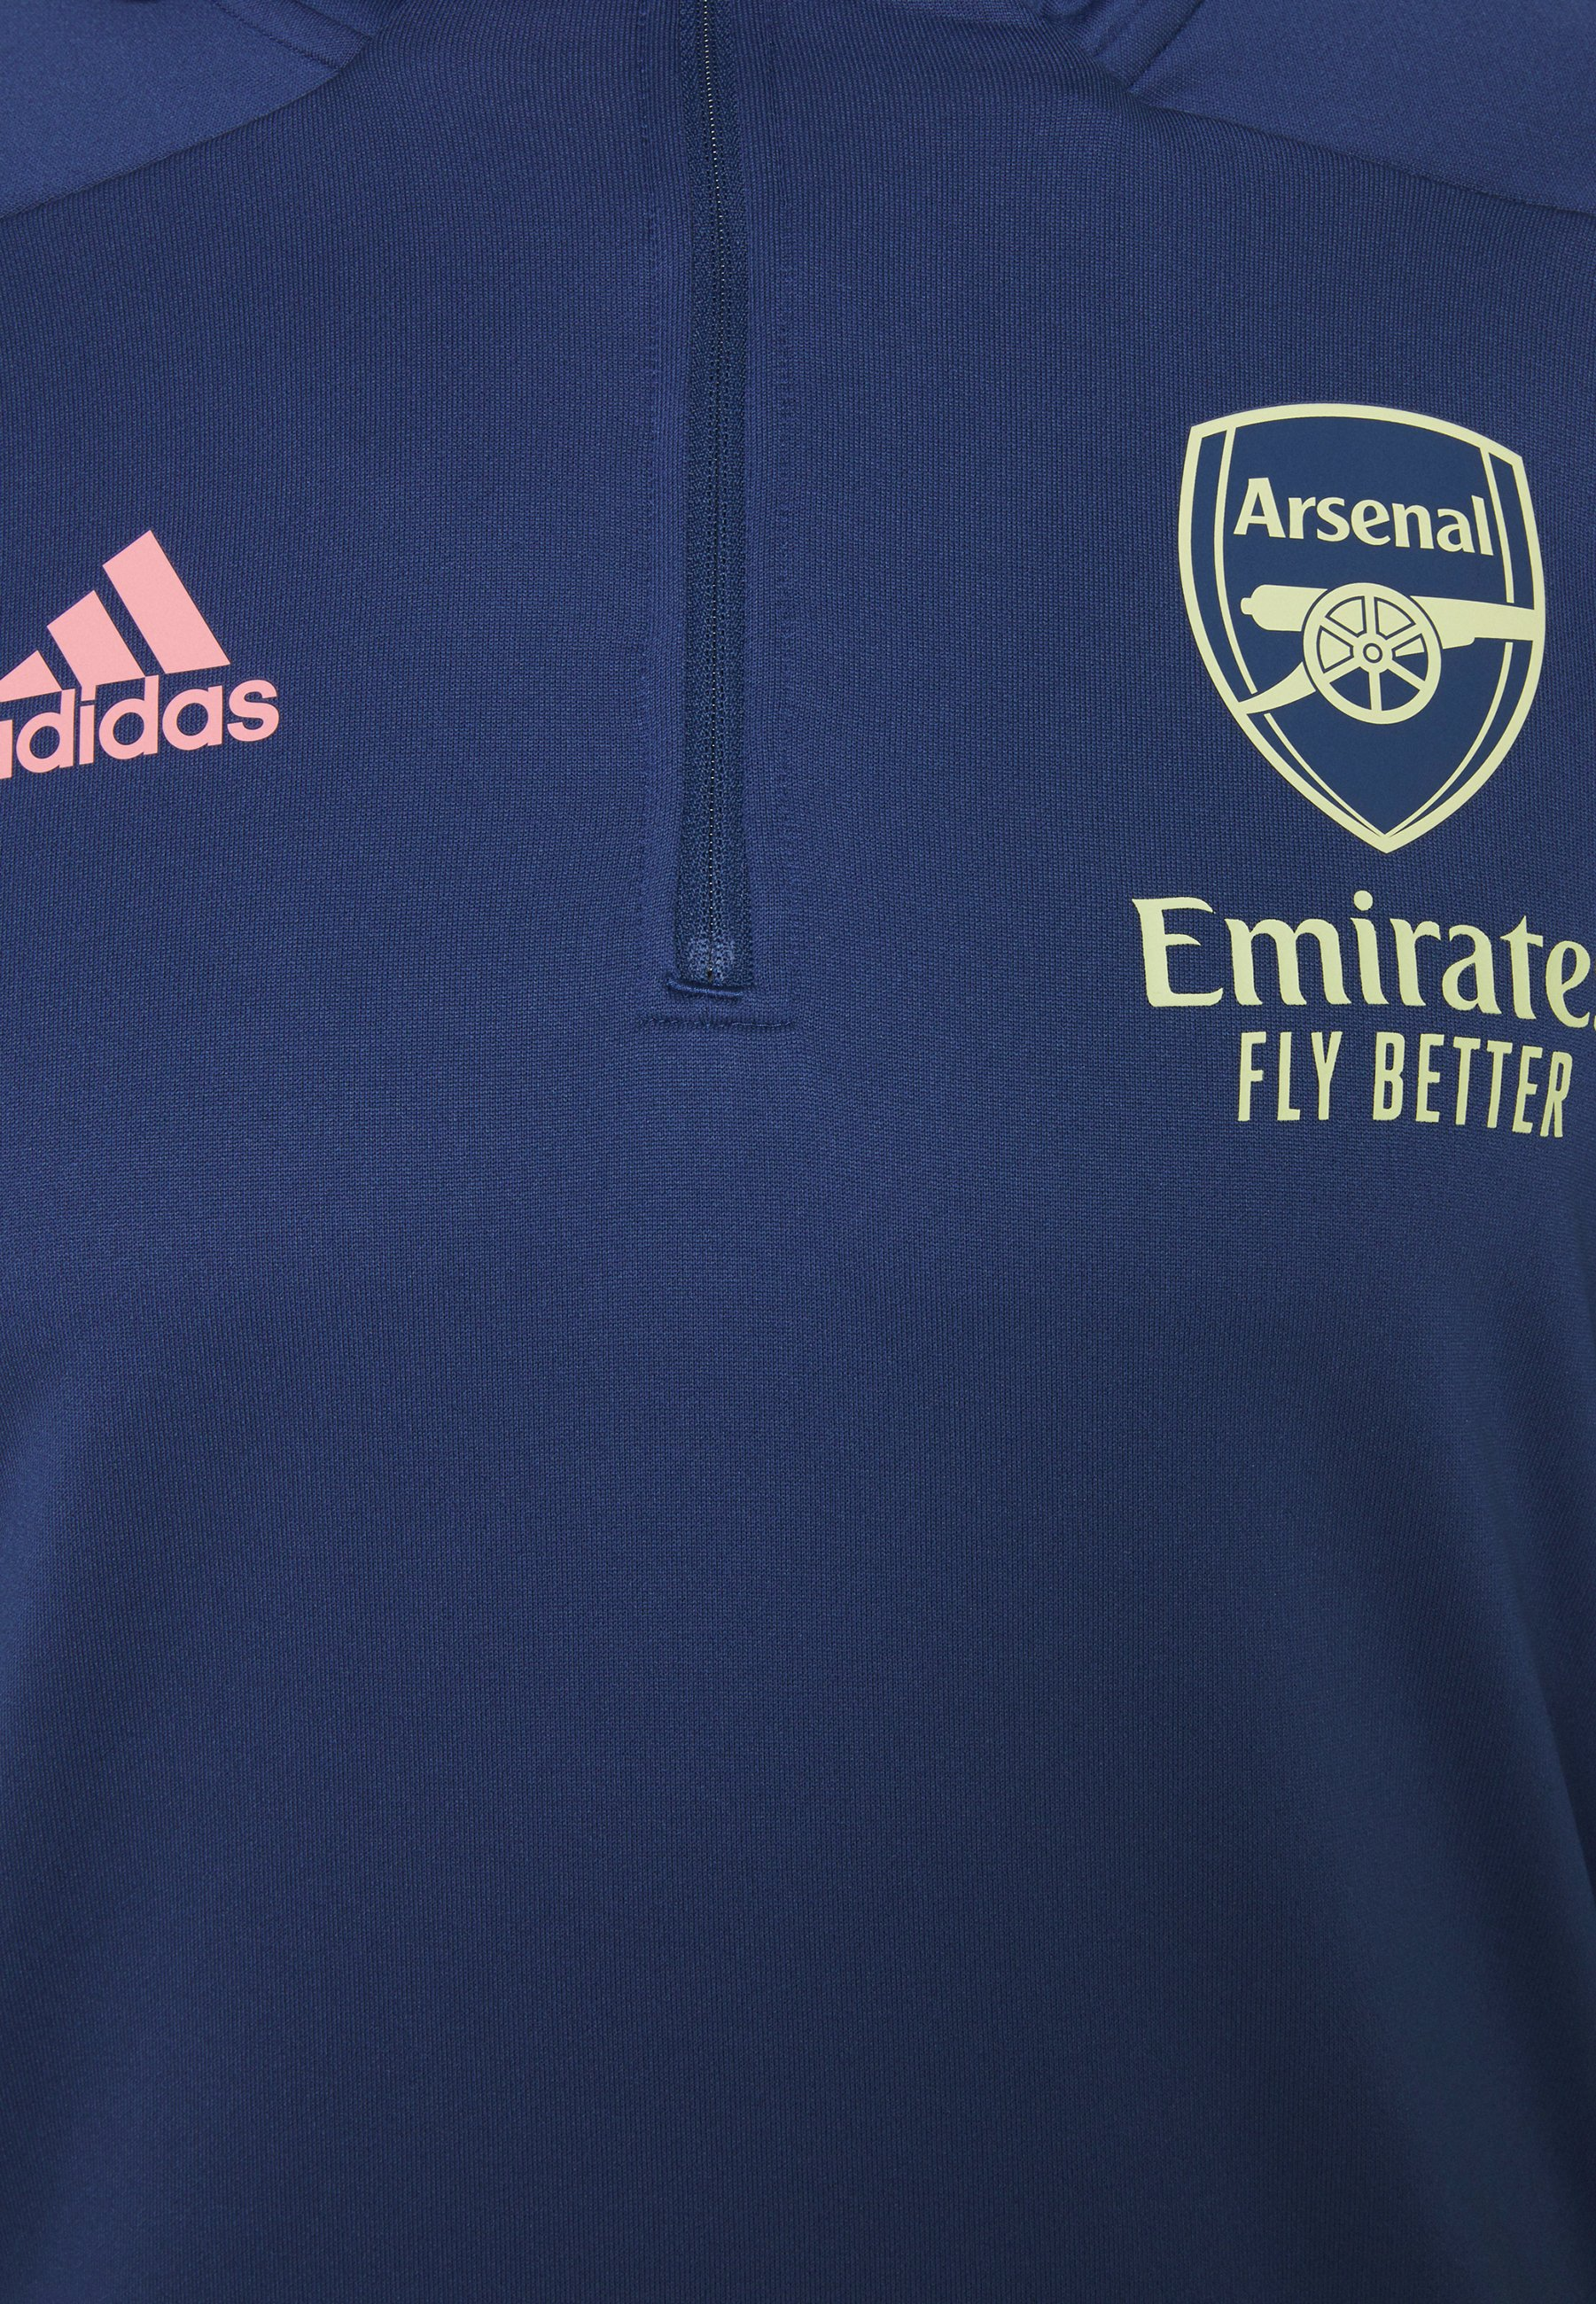 Adidas Performance Arsenal Fc Sports Football - Artykuły Klubowe Blue